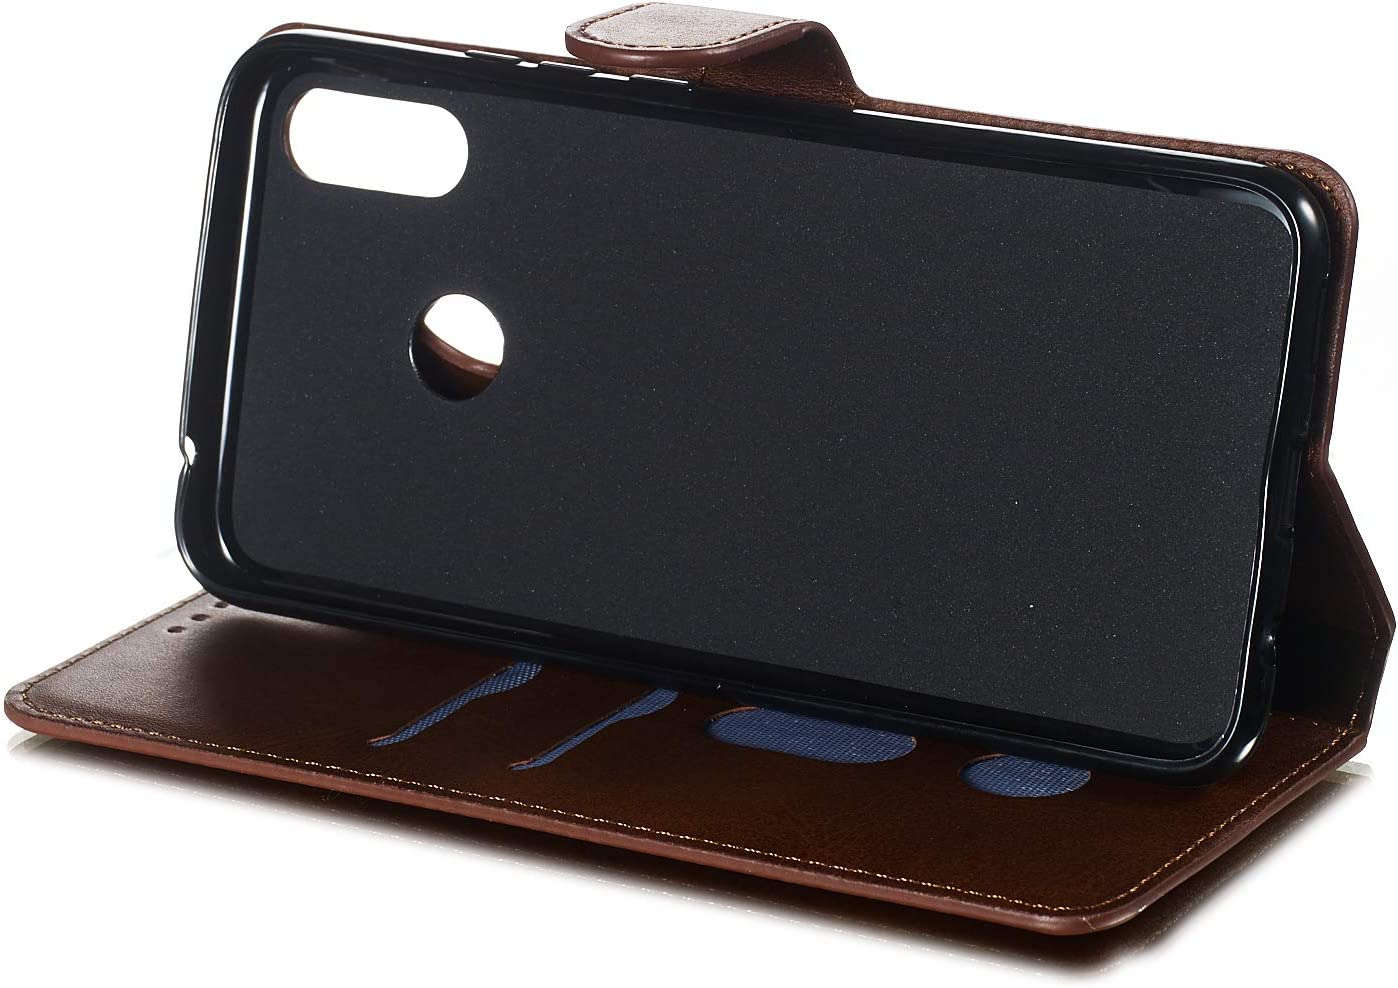 Portafoglio LOYYO080342 Blu Lomogo Cover Huawei P Smart Custodia a Libro Pelle Porta Carte Chiusura Magnetica Antiurto Flip Wallet Case per Huawei P Smart Plus//Nova 3i